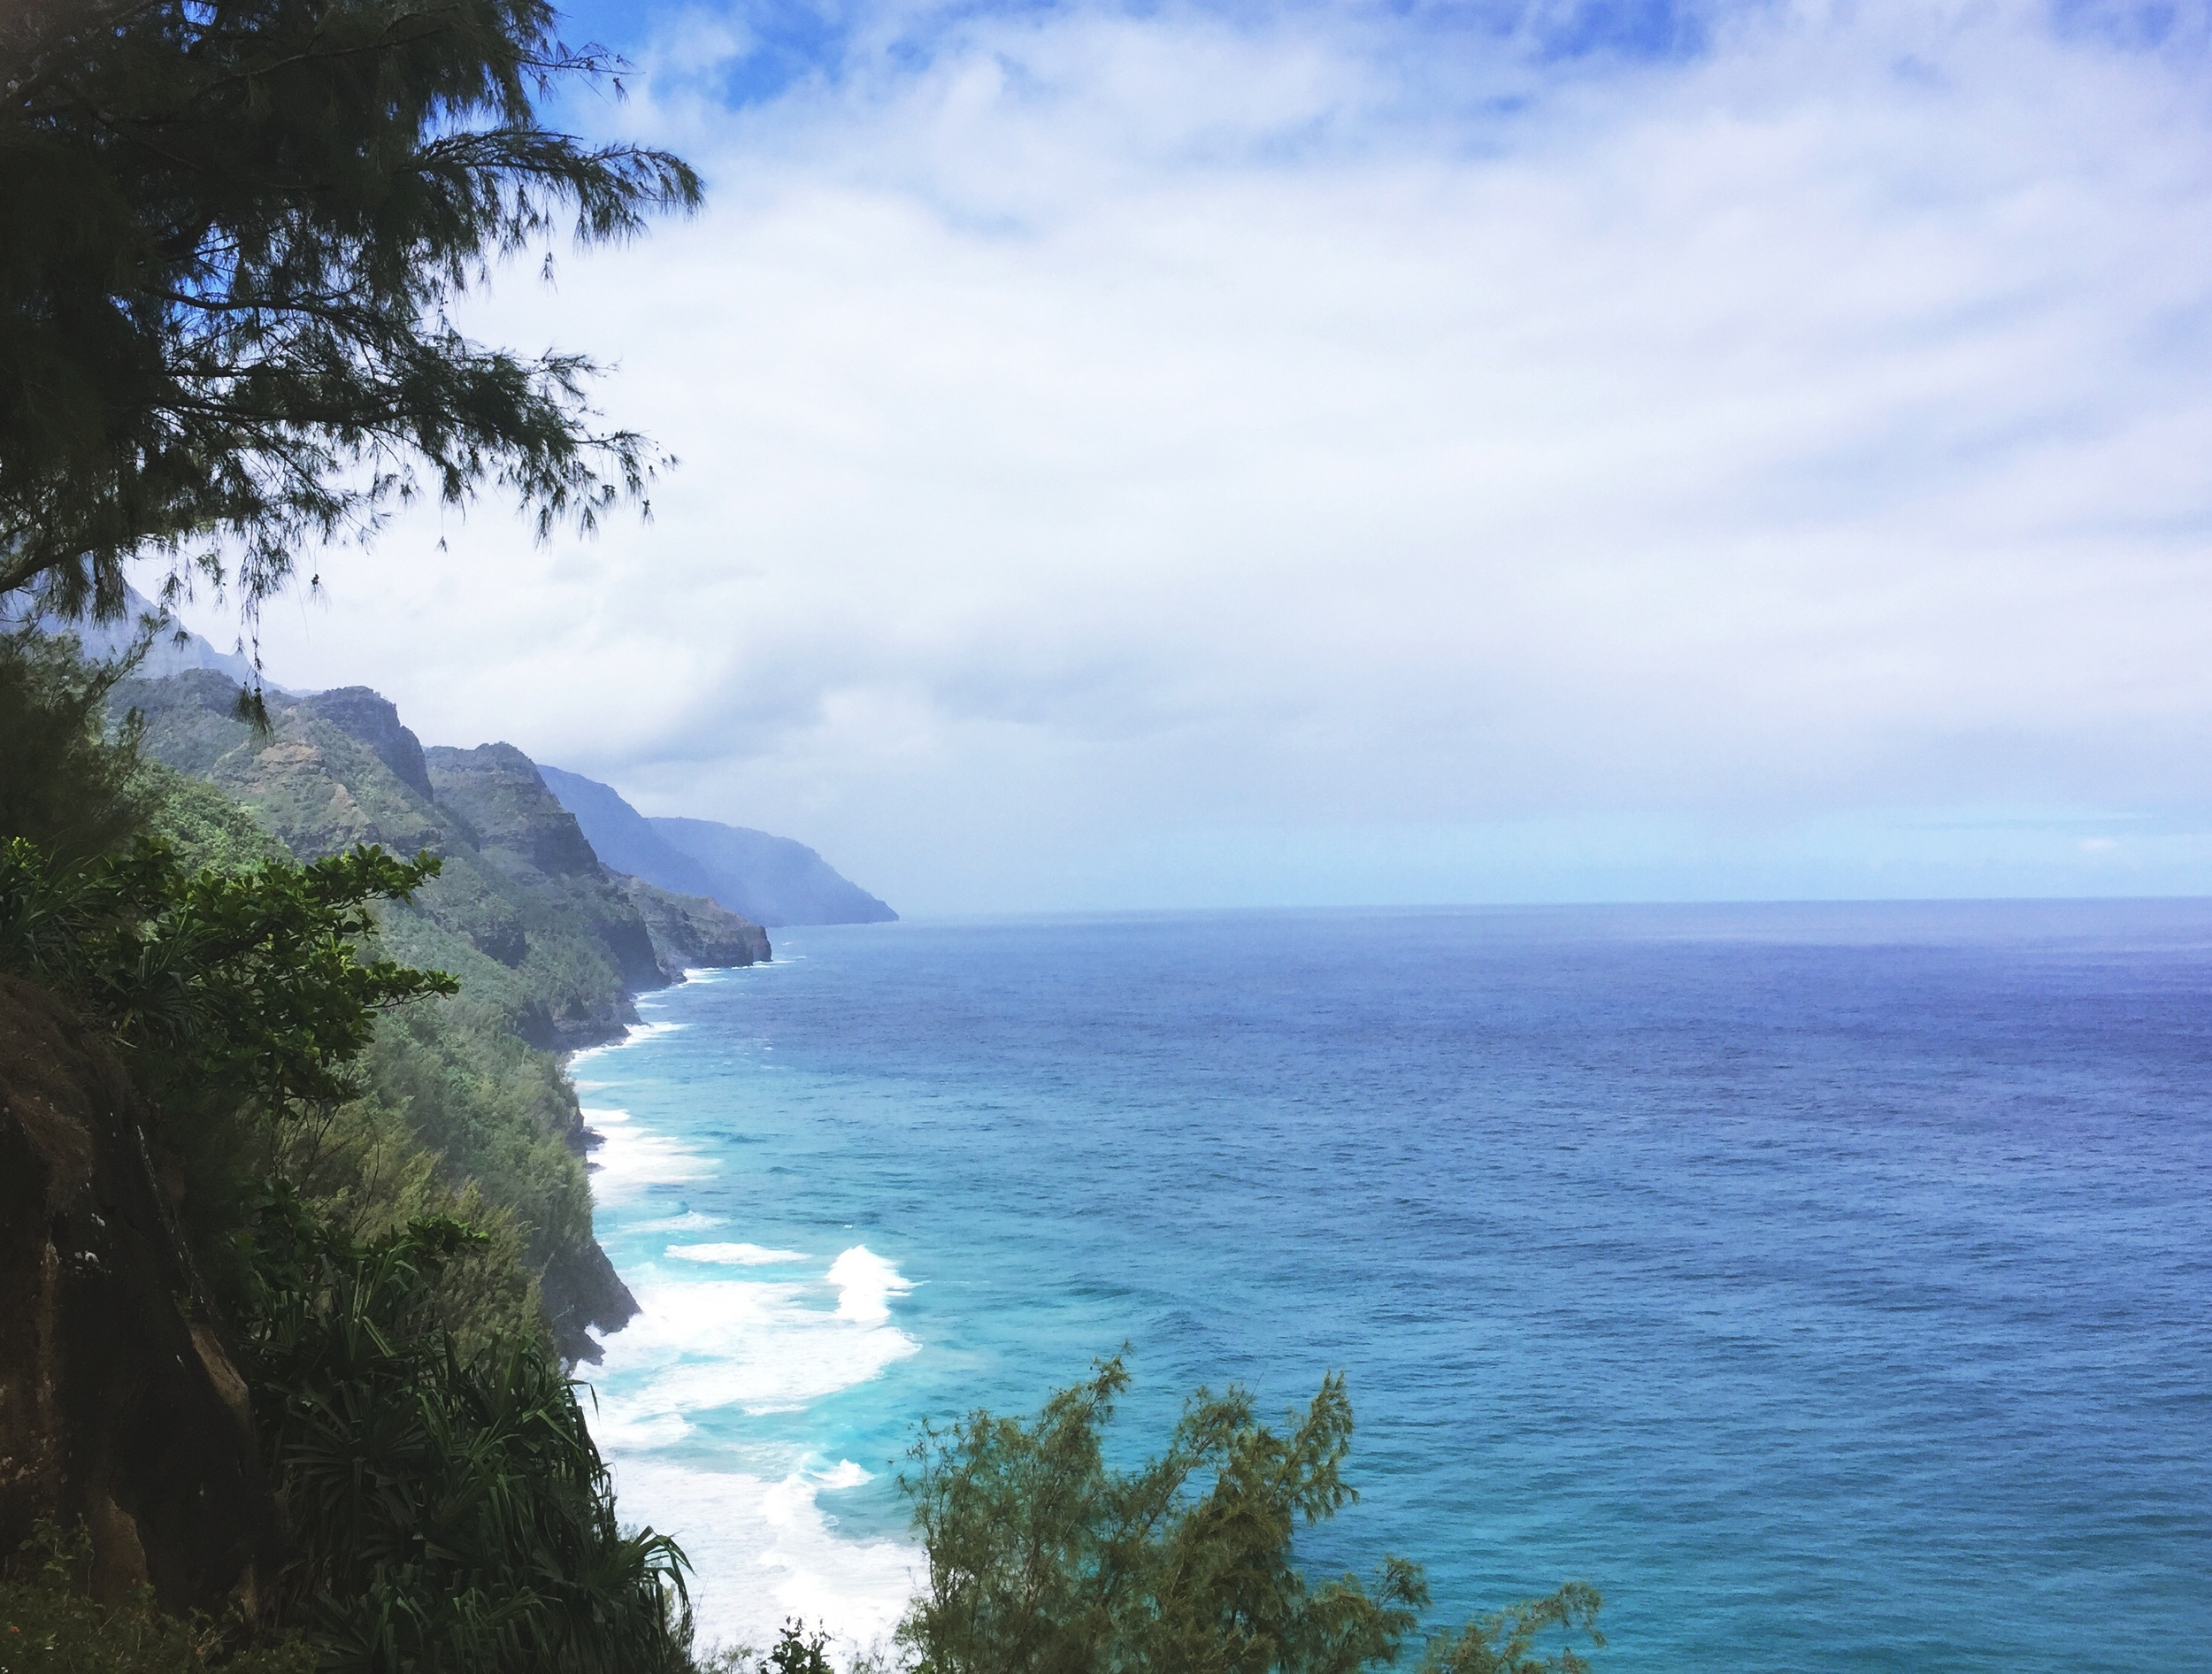 Napali coast view